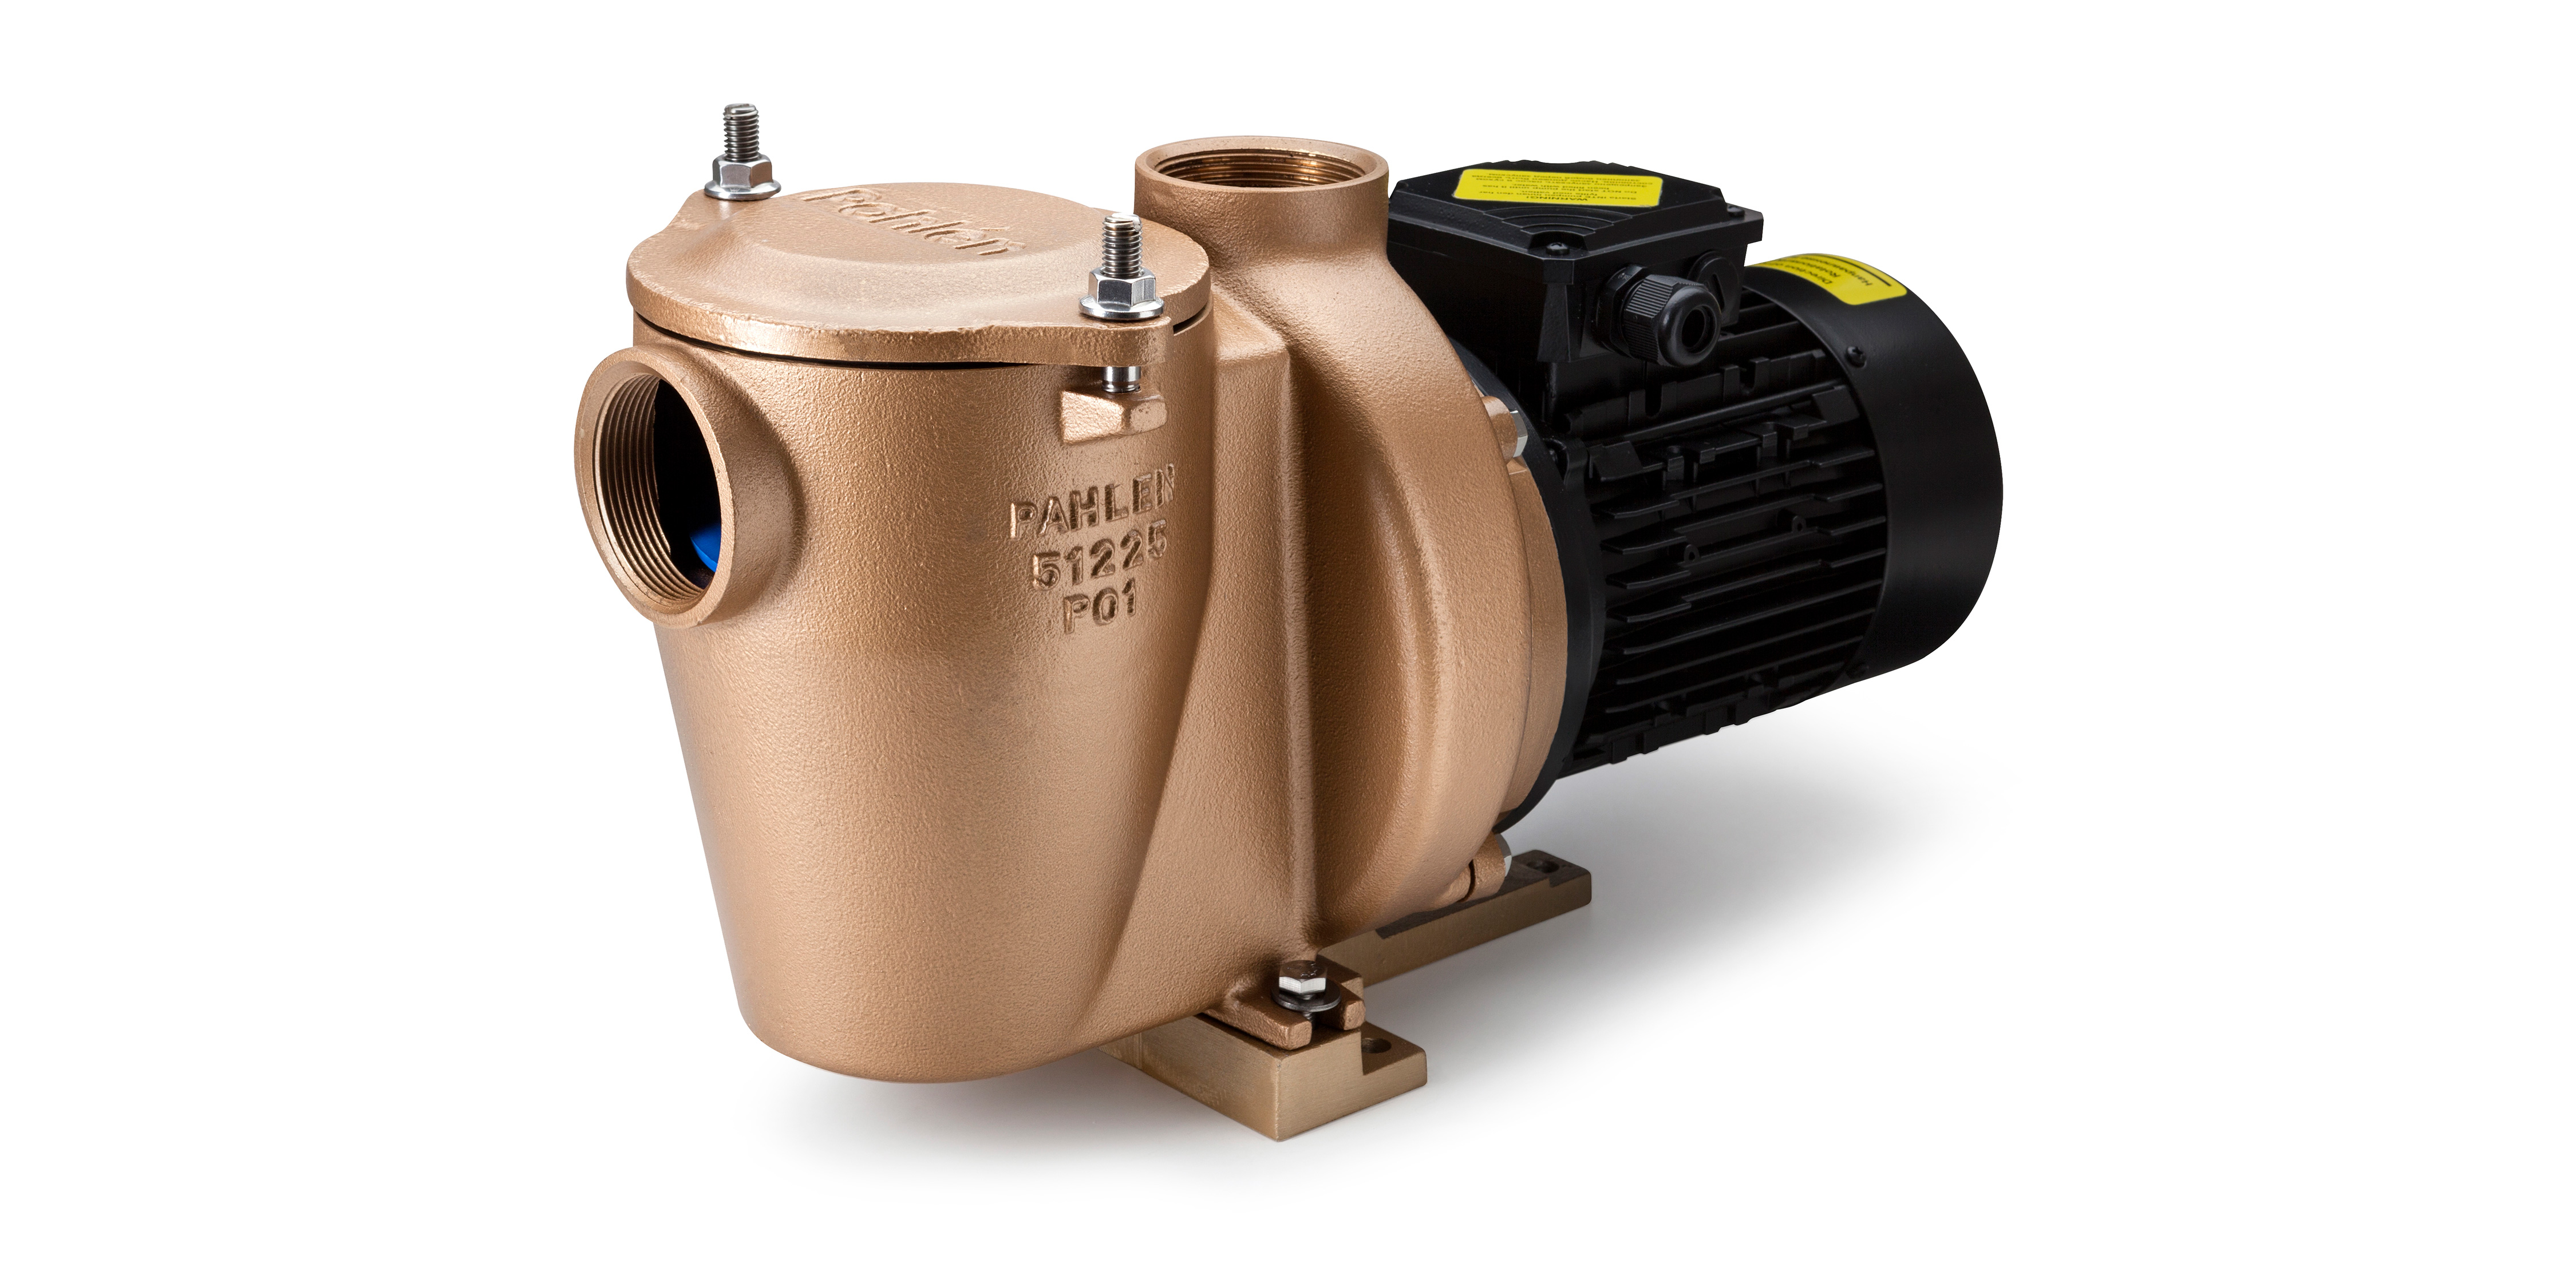 High Quality Bronze Alloy Swimming Pool Pump P01 Pahlen